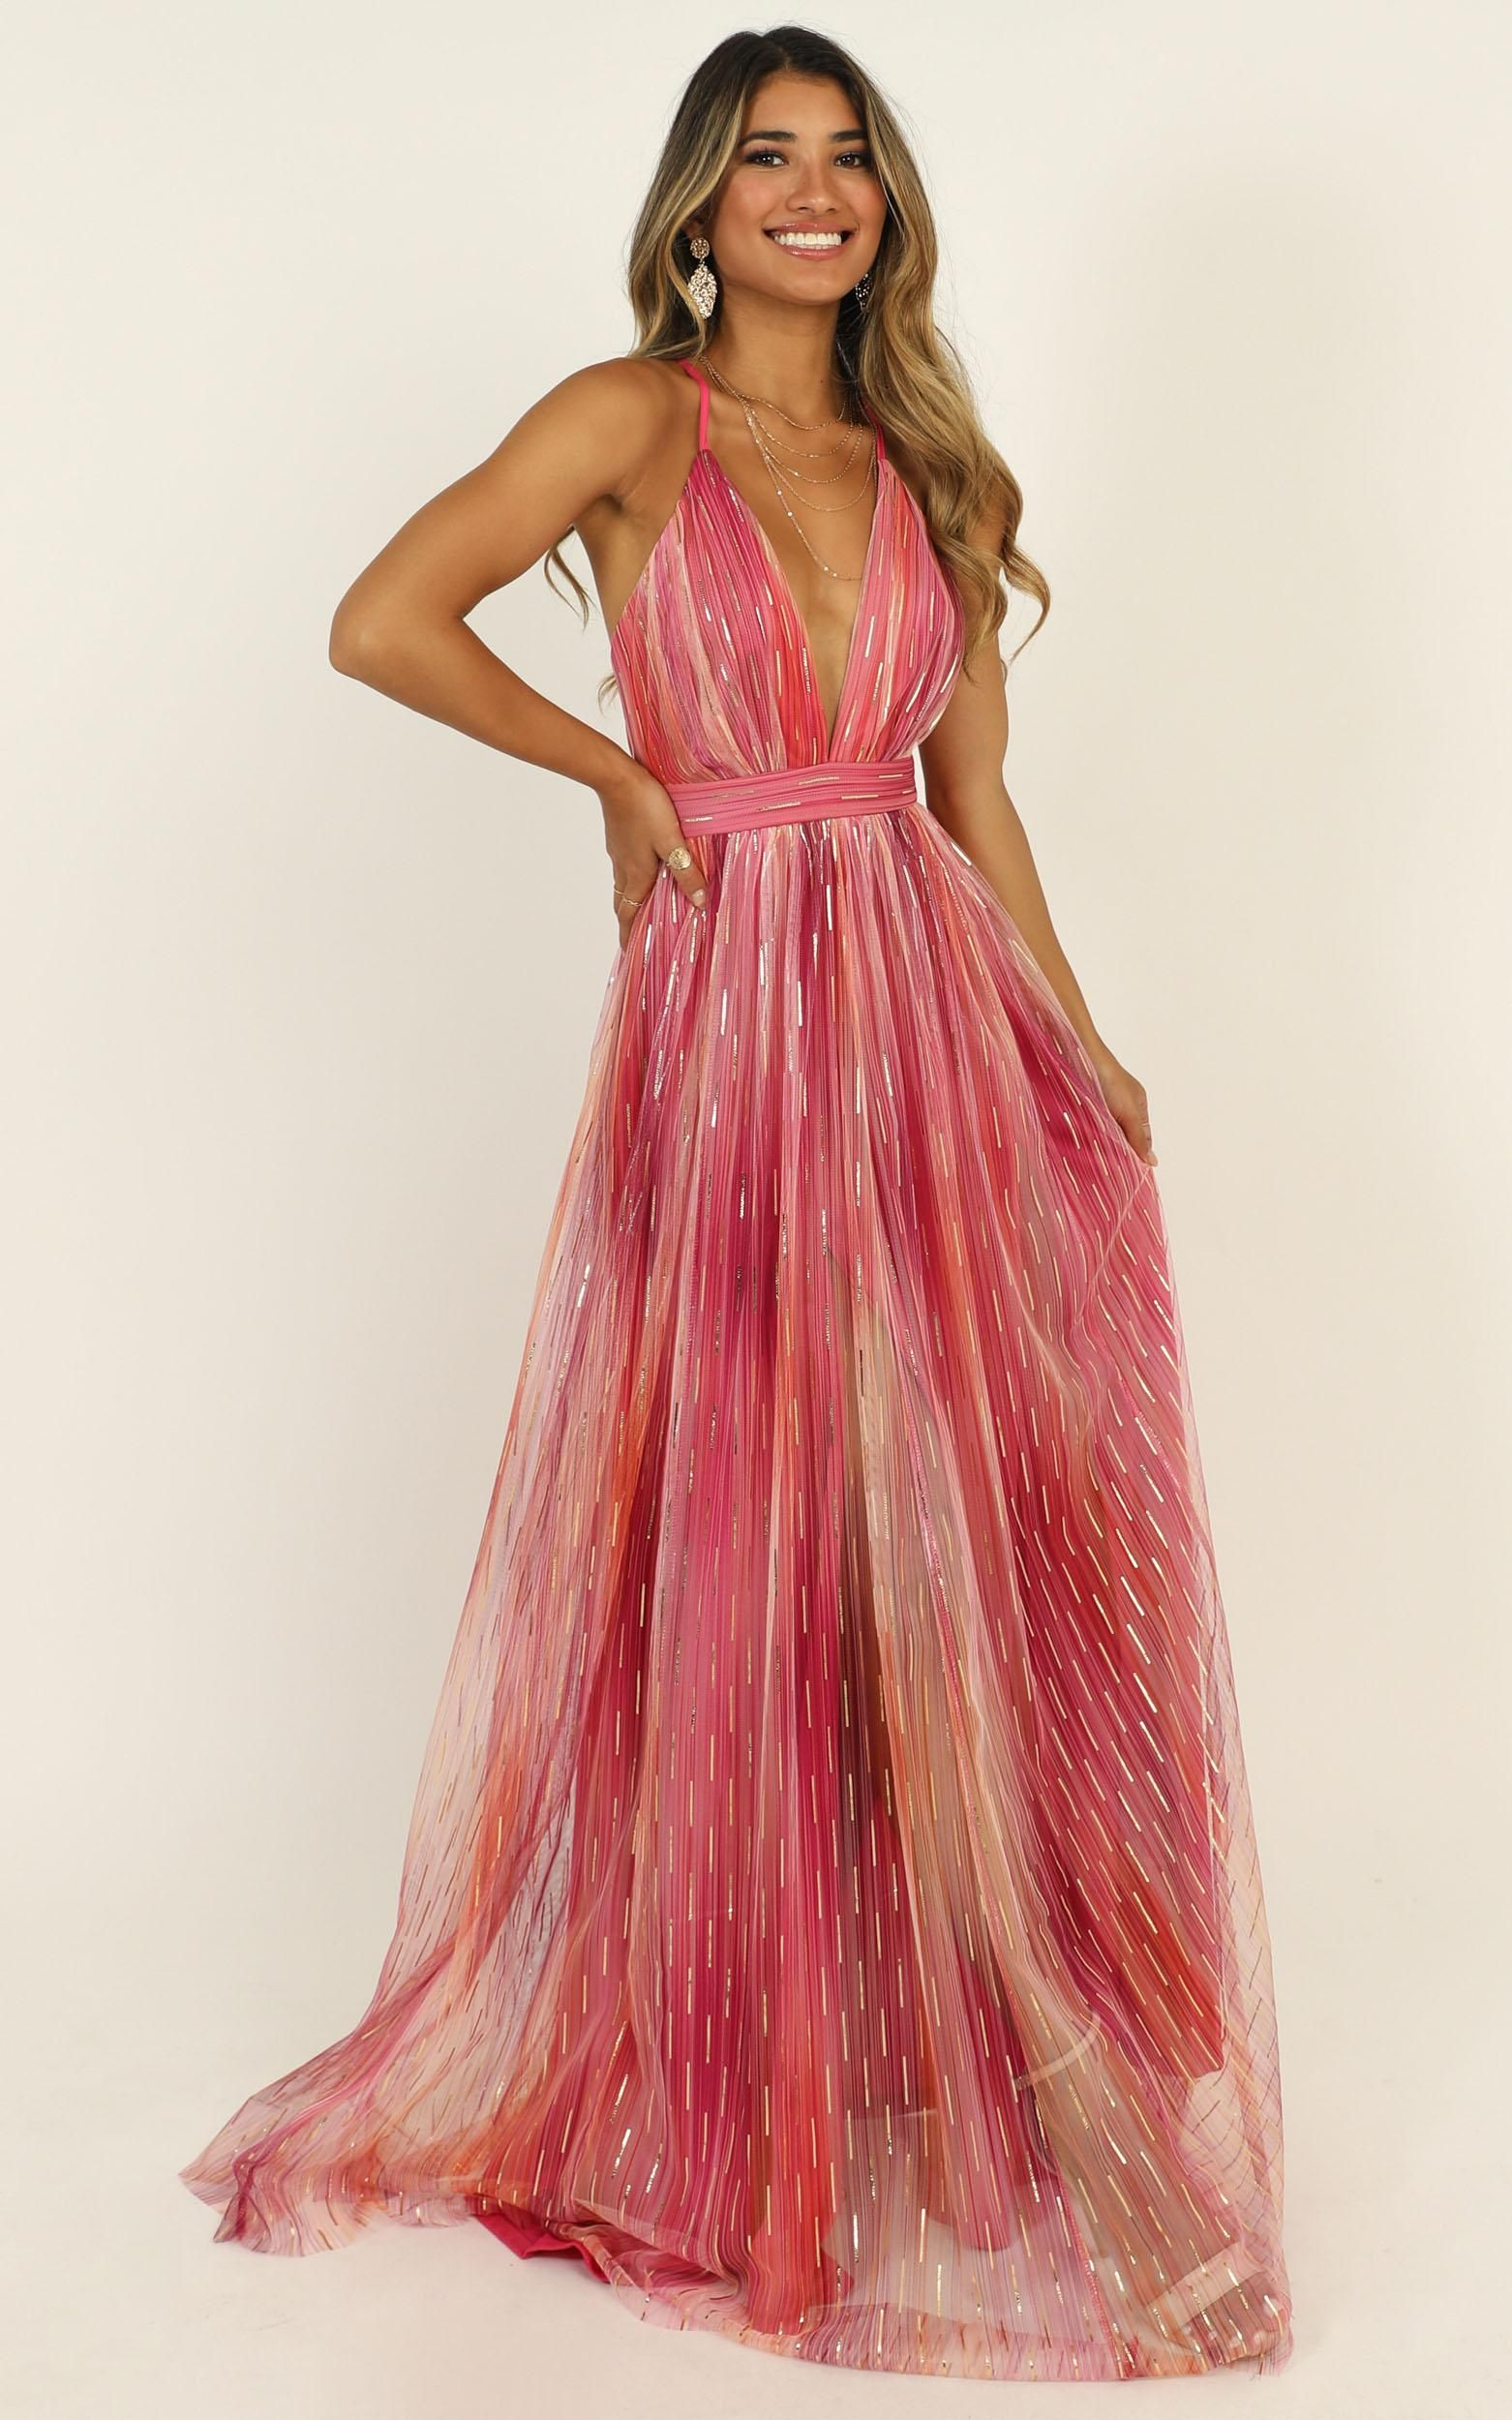 Dance All Night Maxi Dress In Fuschia Showpo Maxi Dress Dresses Fashion [ 2500 x 1562 Pixel ]